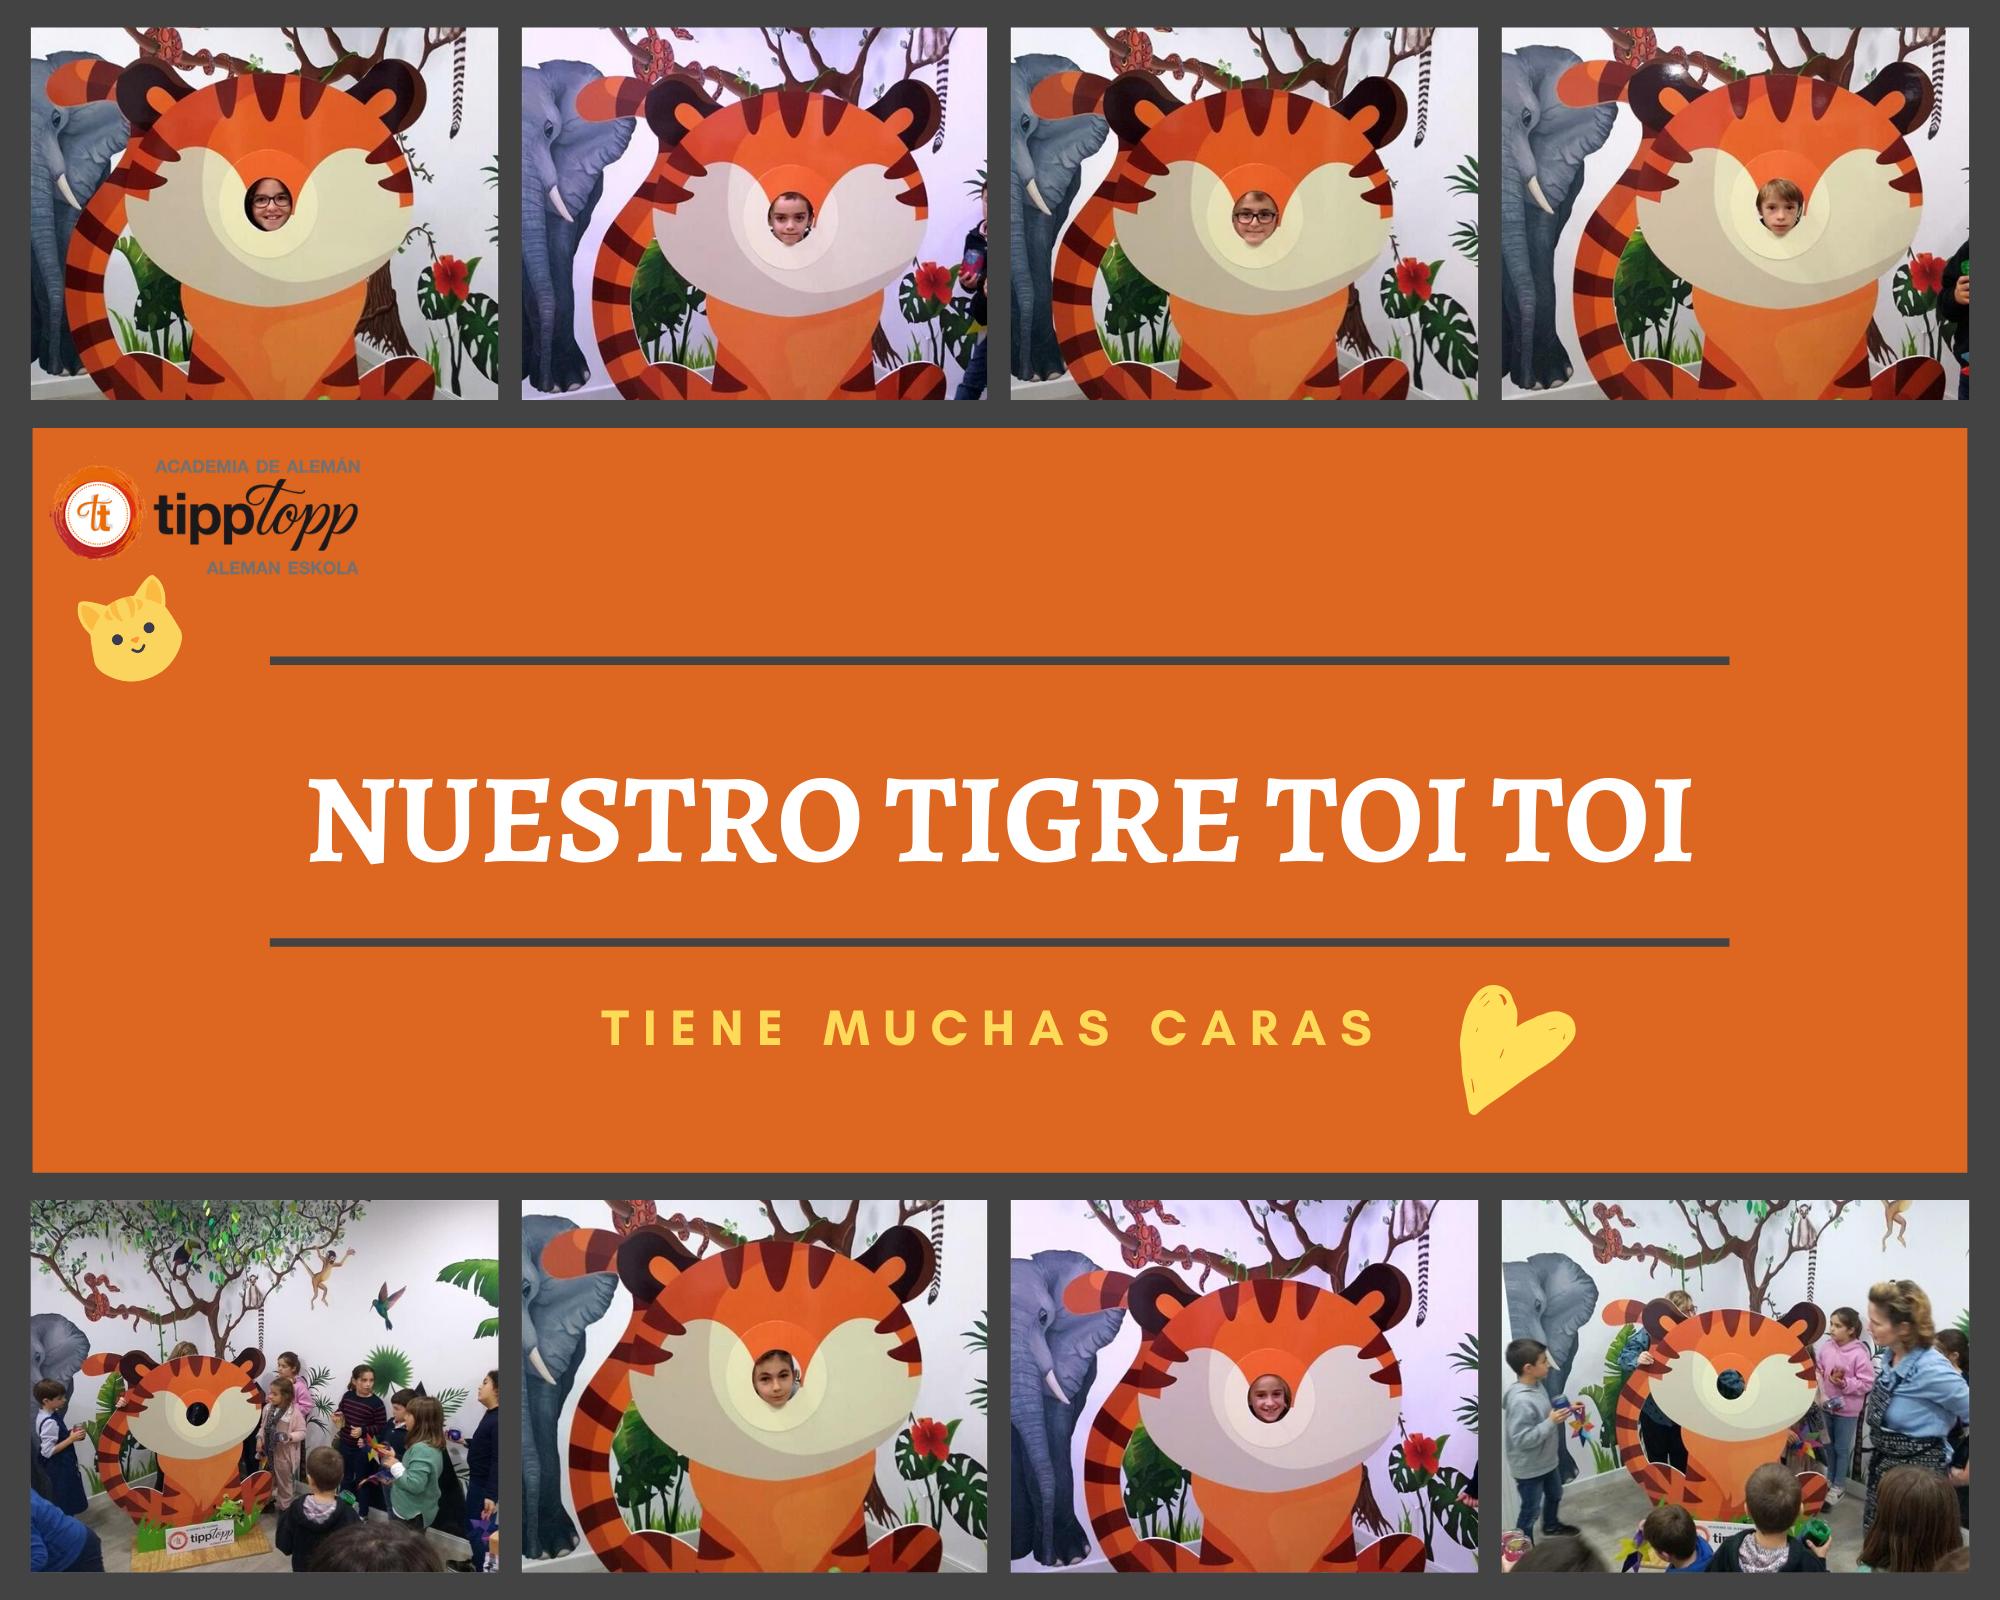 2019-tipptopp-tiger